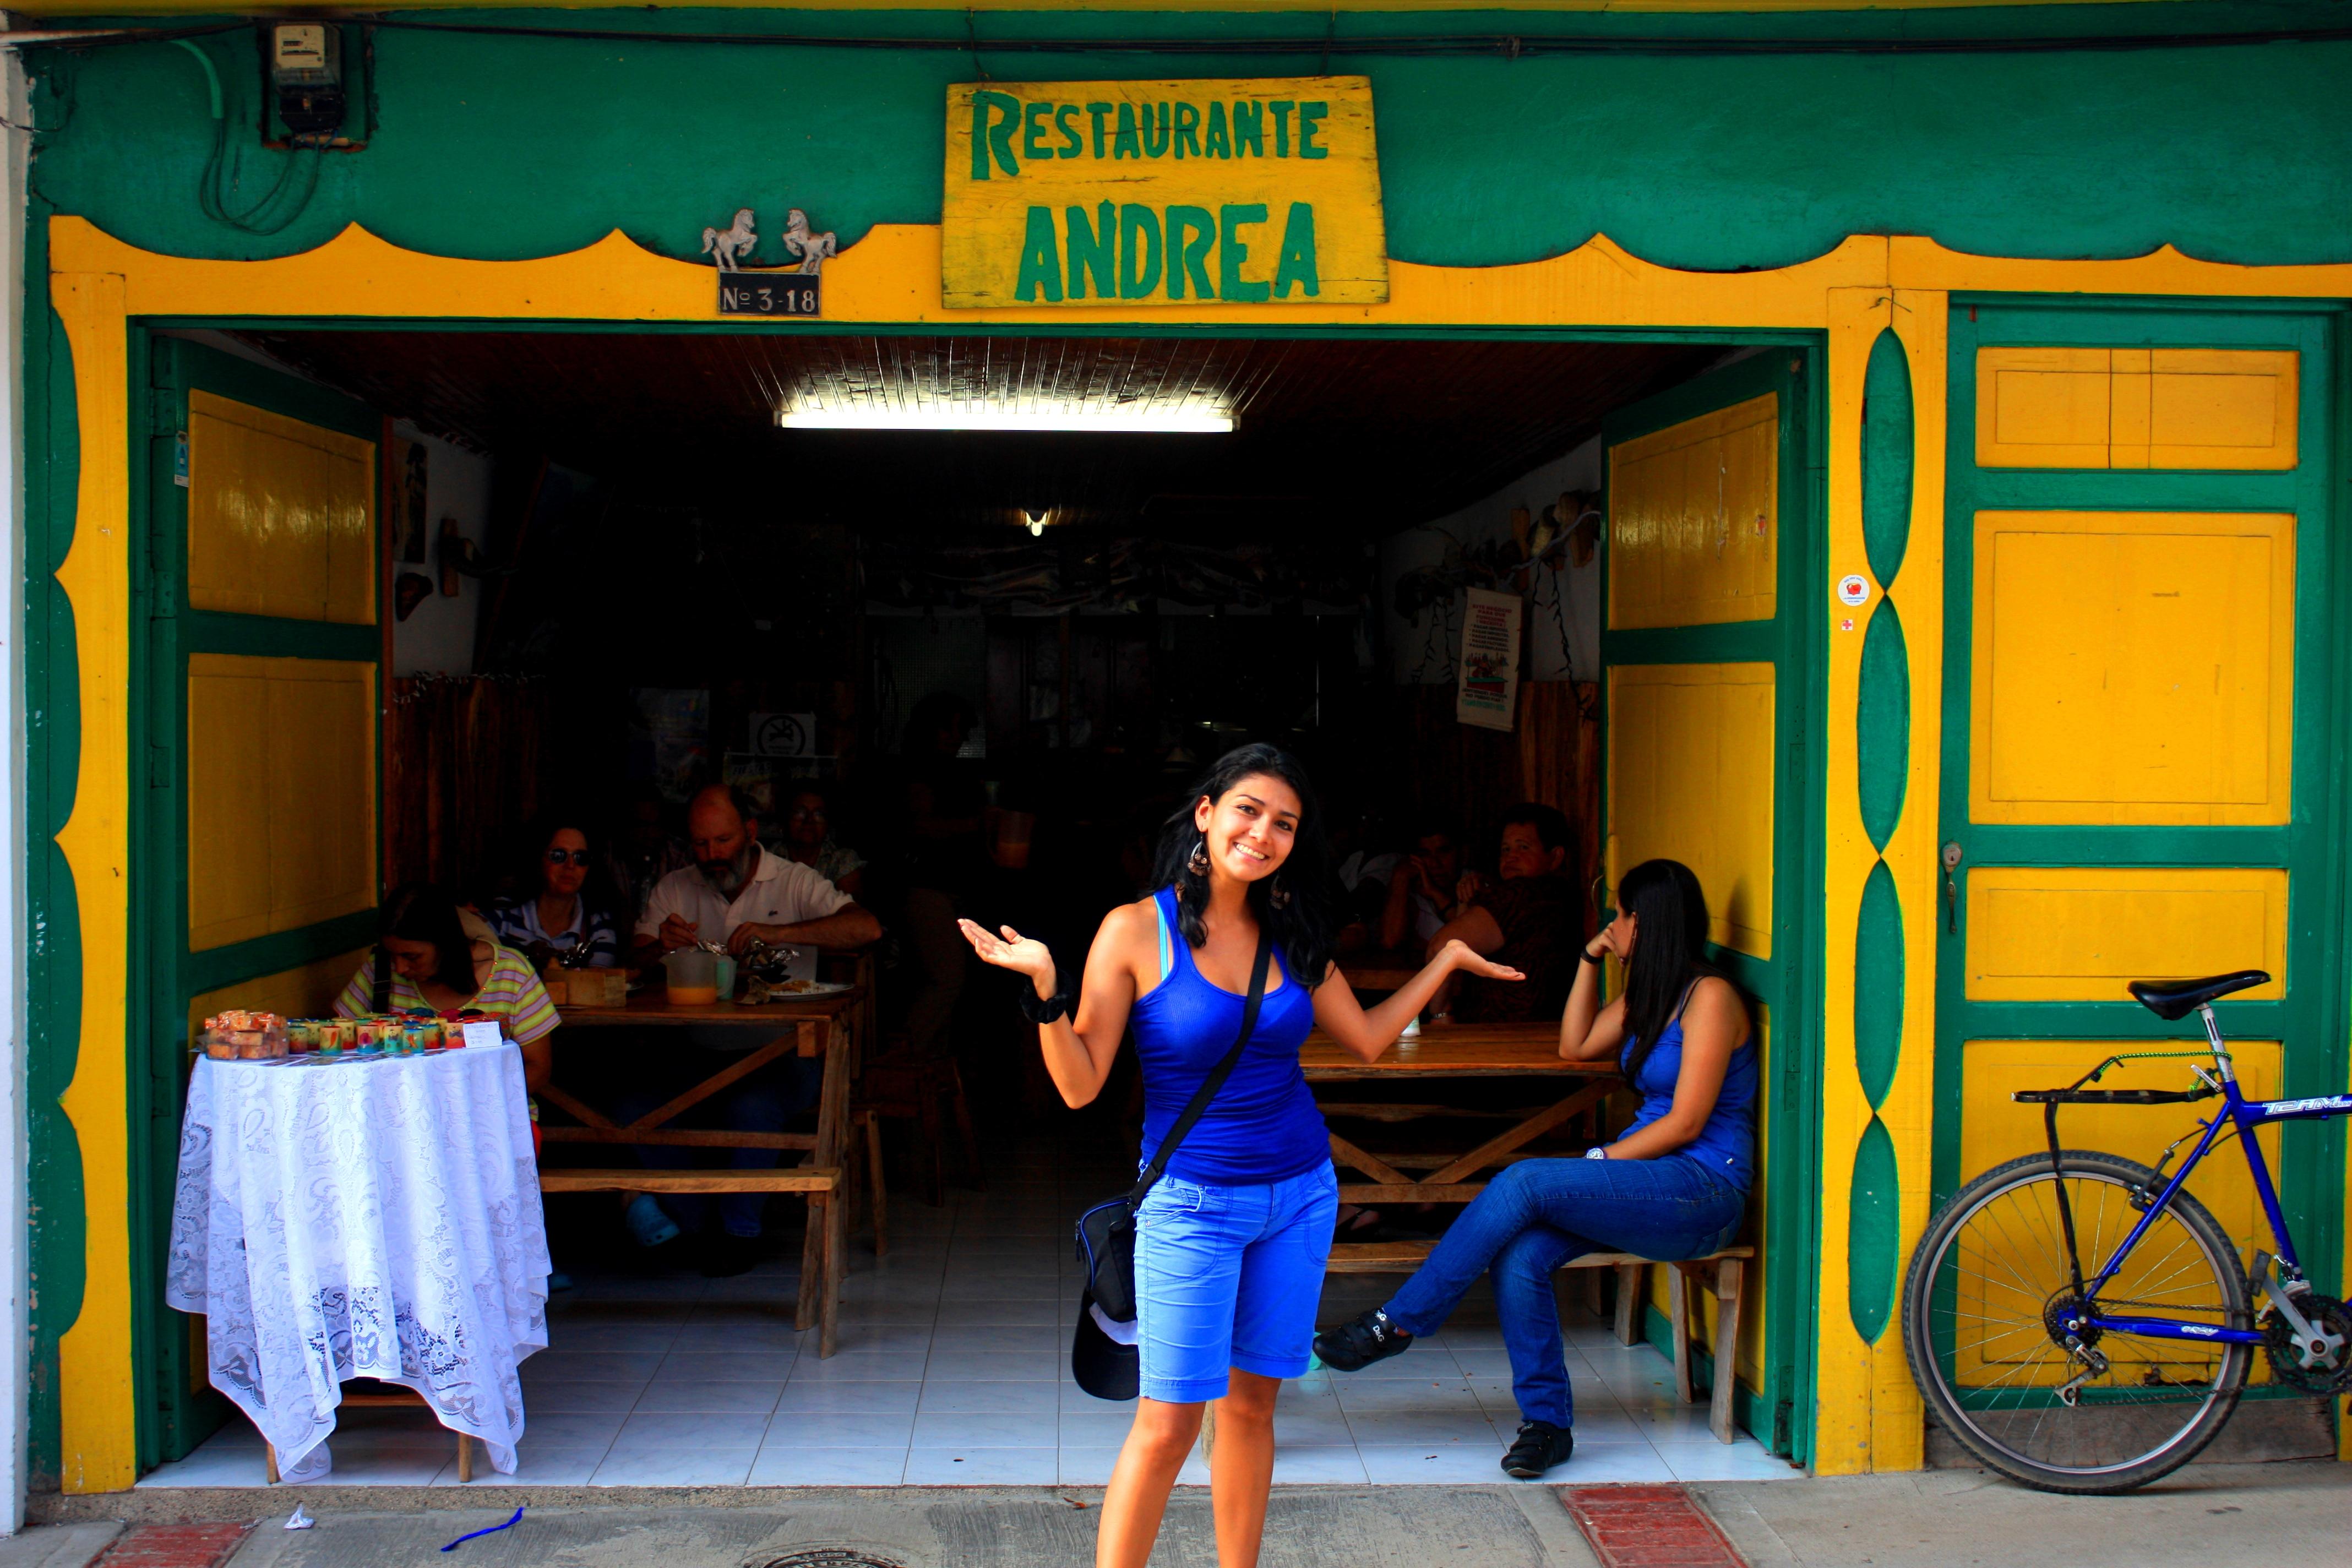 Andrea S Restaurant Waldwick Nj Review